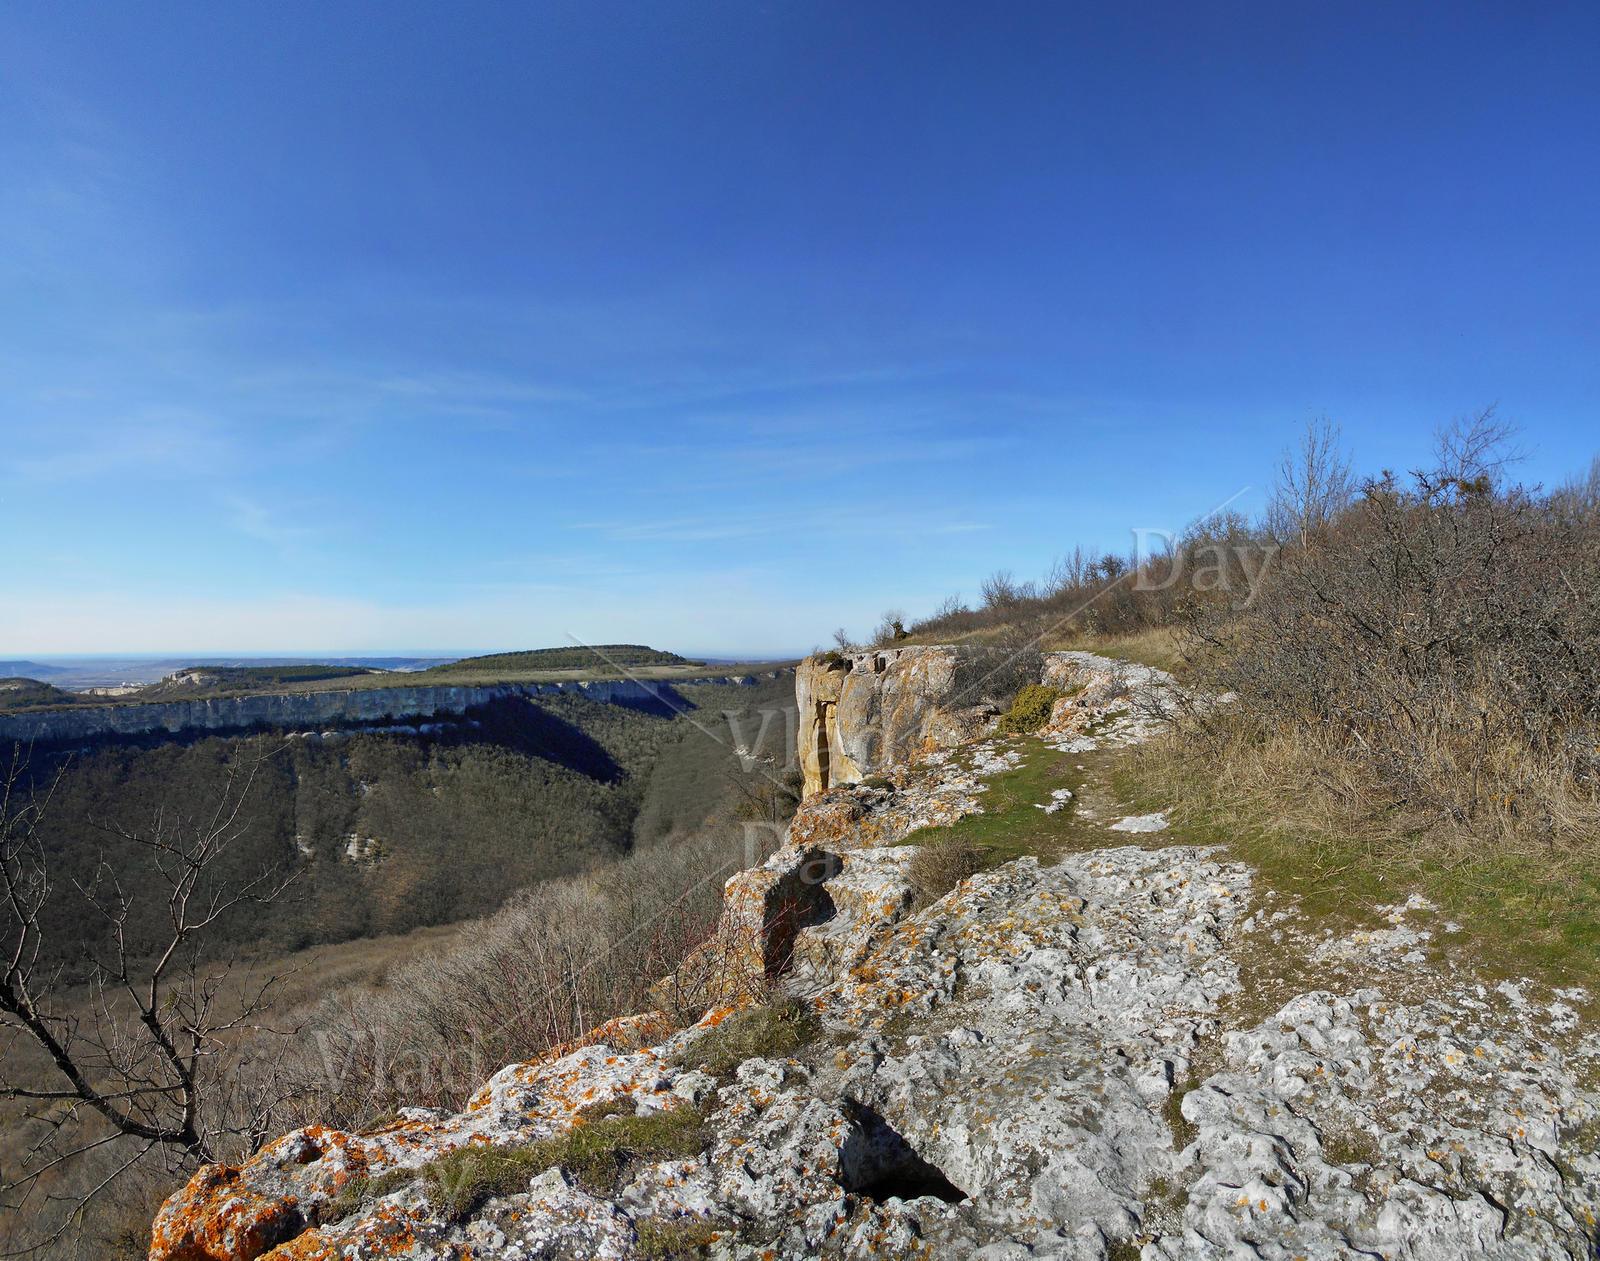 Mount Tepe Kermen, Crimea, March 5 2017 by anyword